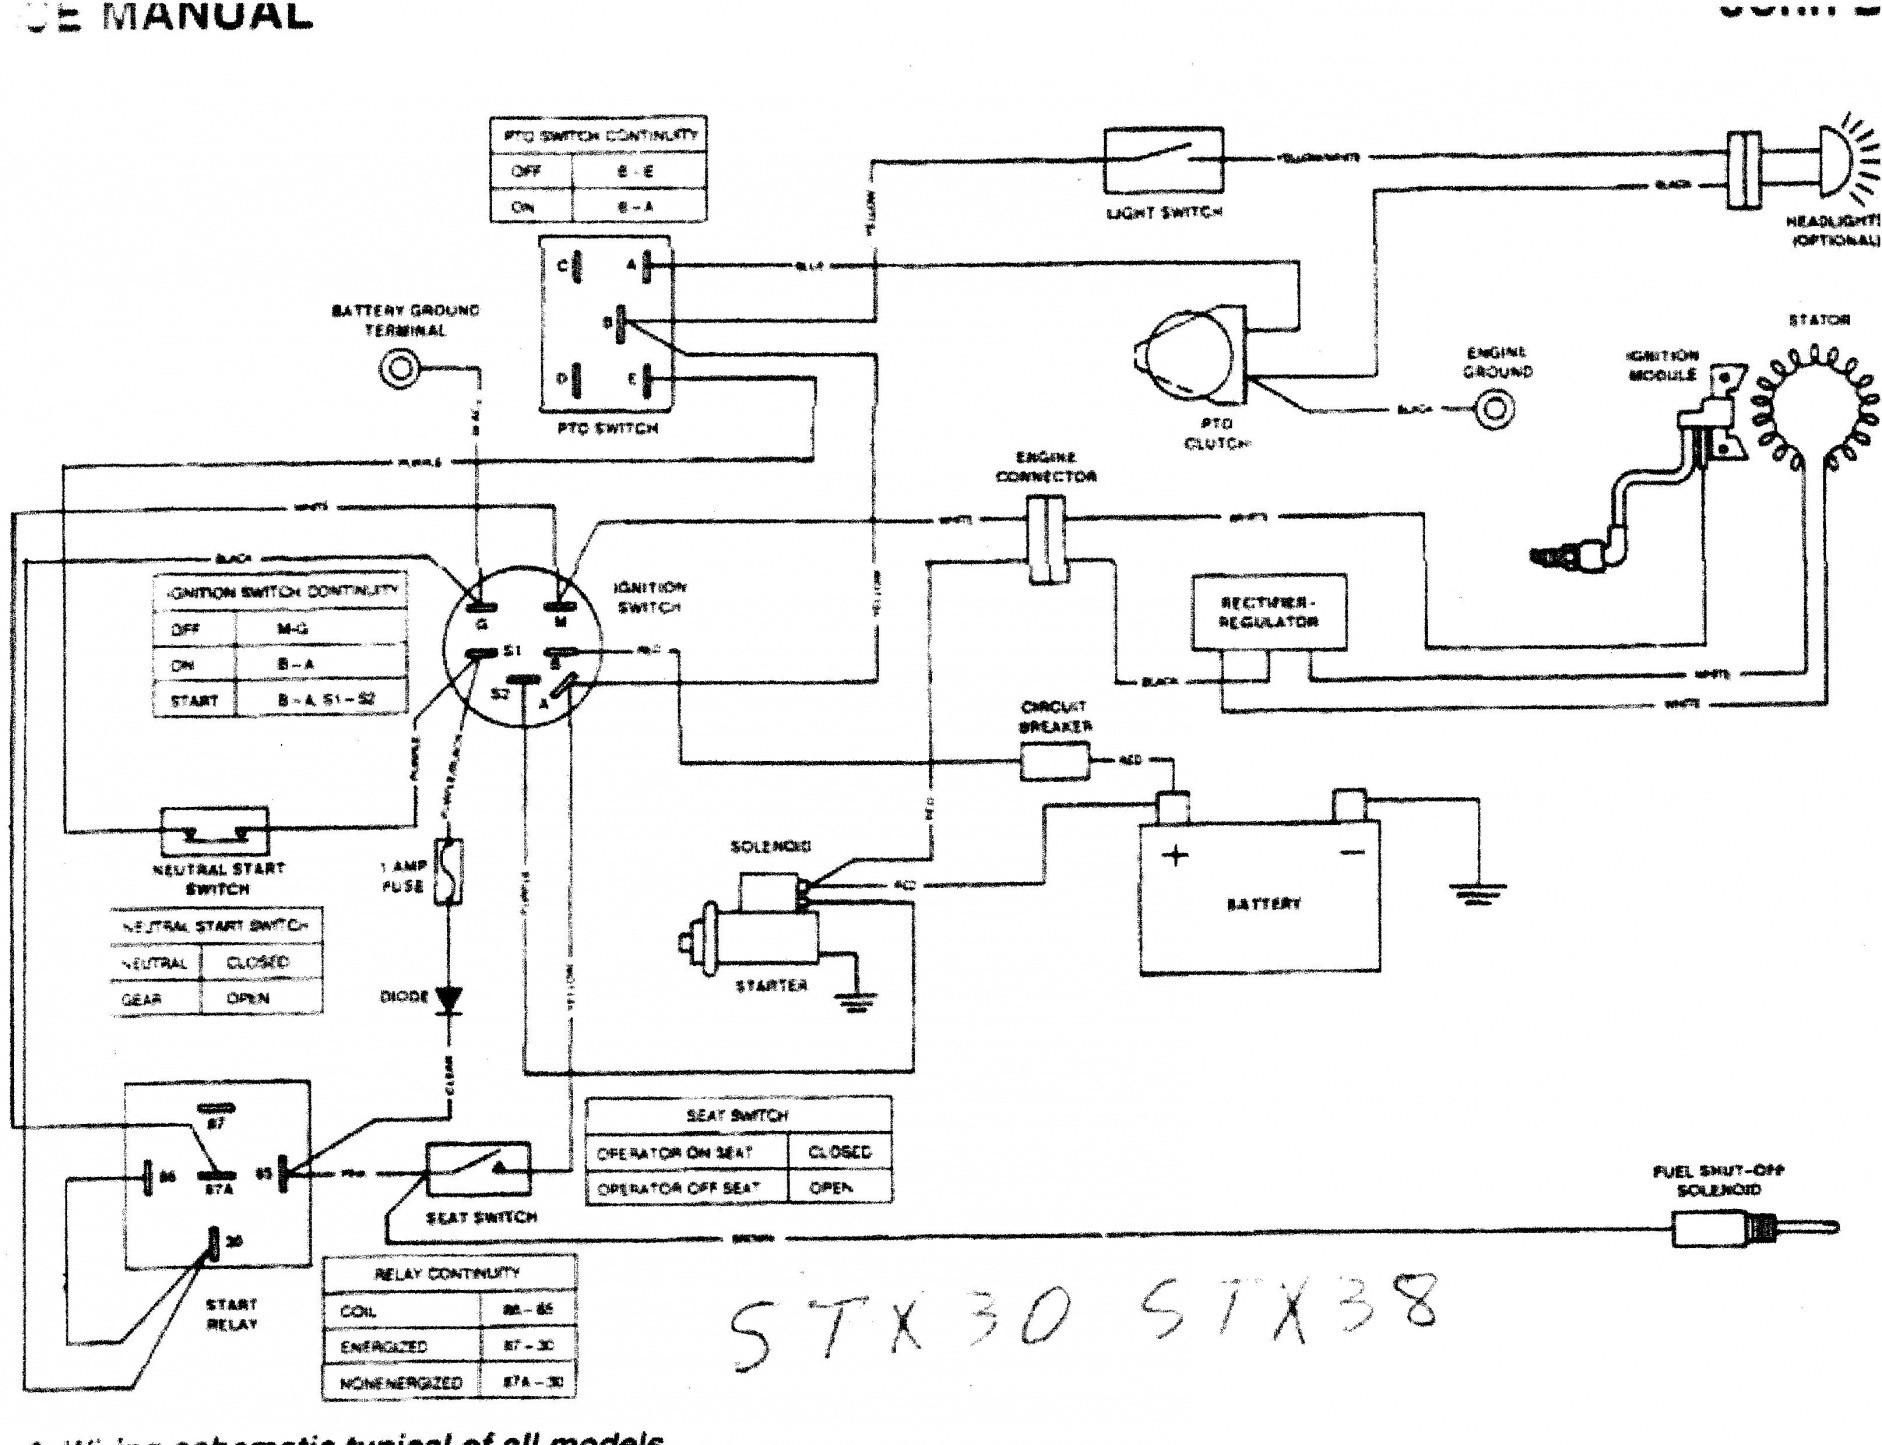 John Deere Lt150 Wiring Diagram 433 Free John Deere Light Wiring Diagram Of John Deere Lt150 Wiring Diagram